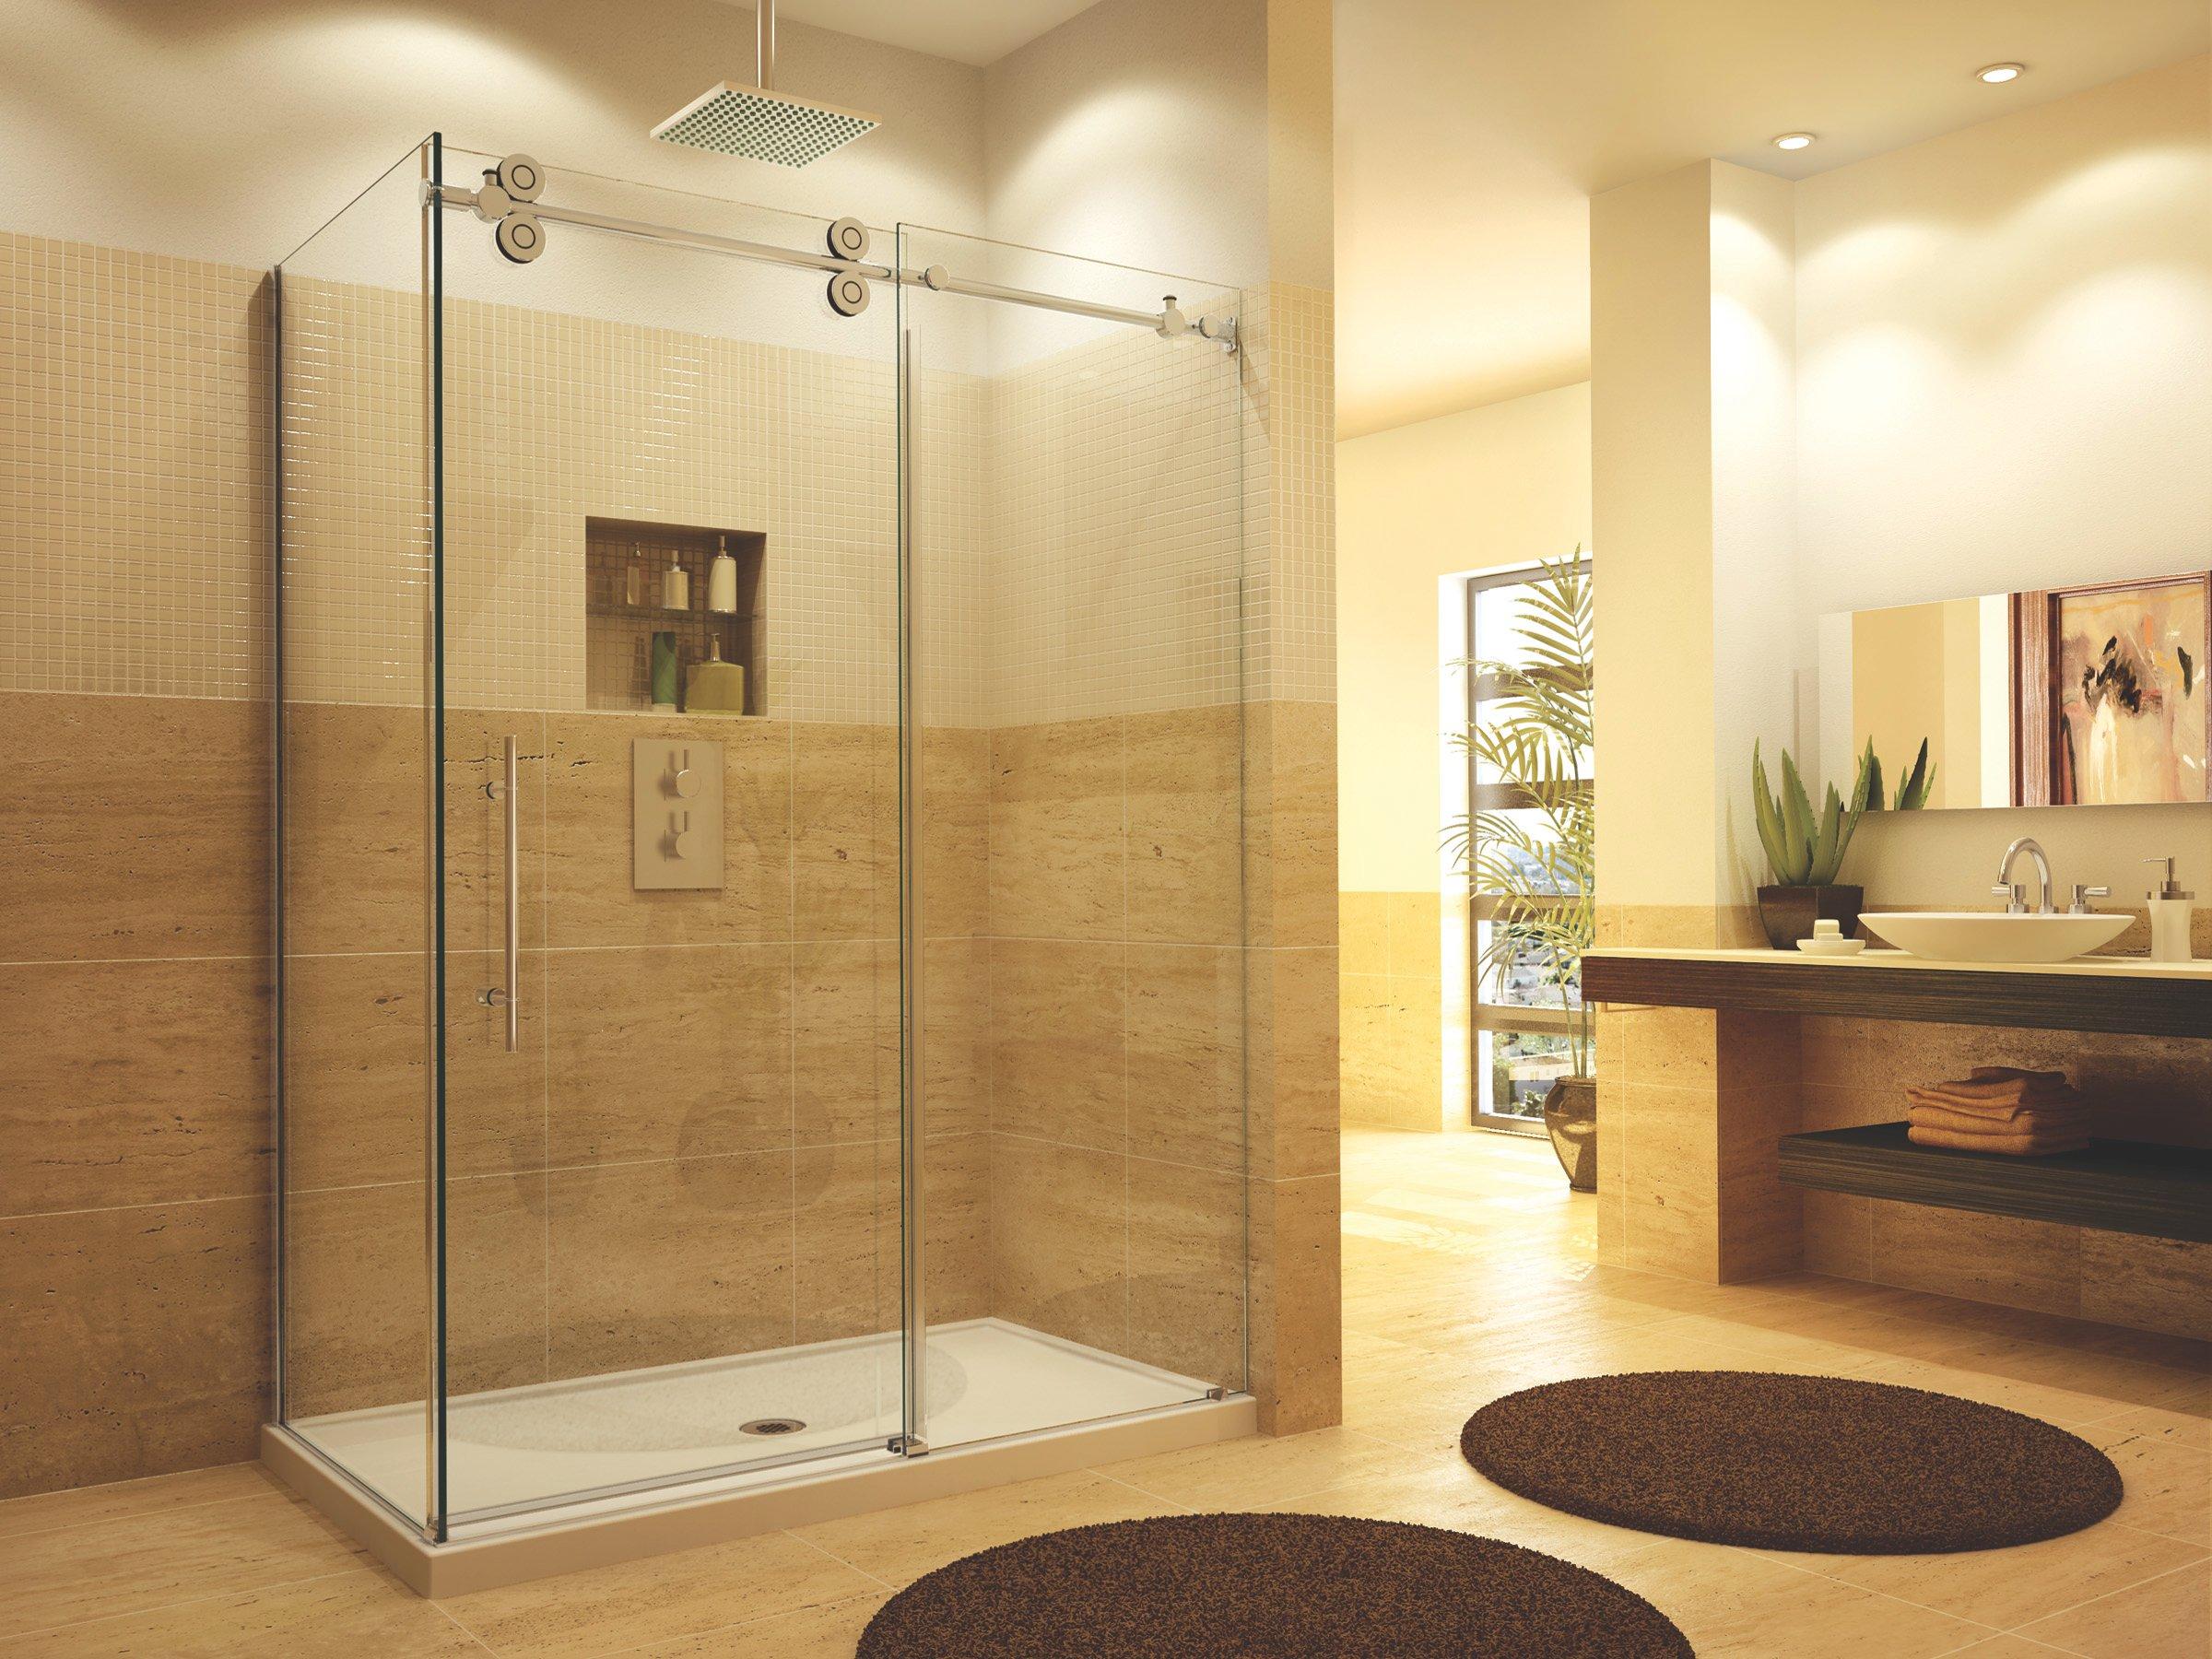 Glass Shower Doors Rochester Ny - Glass Door Ideas